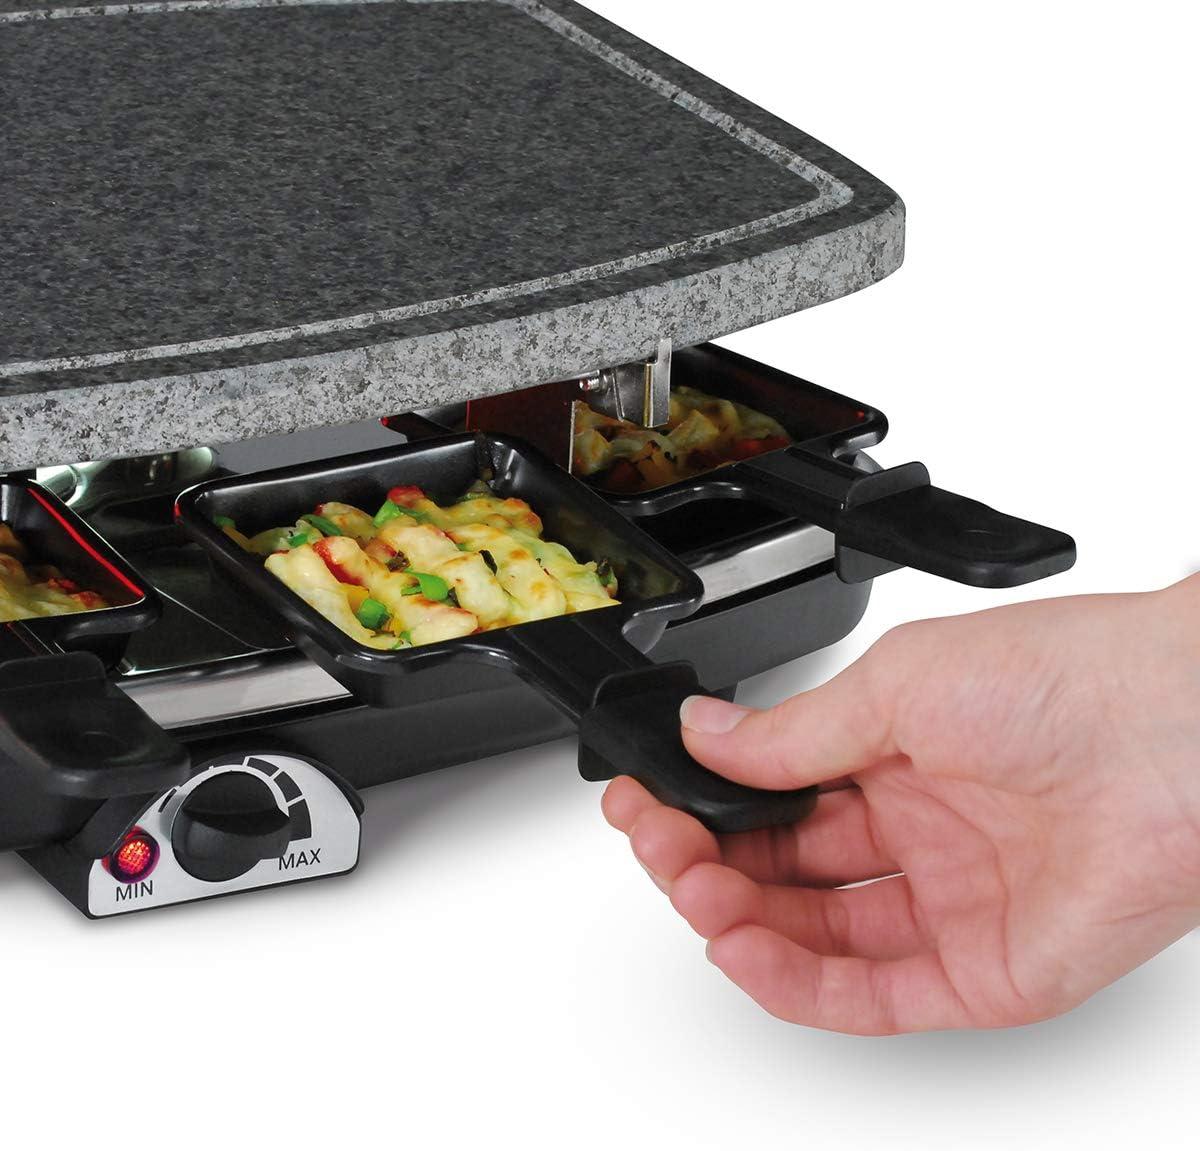 B-Ware Cloer Raclette Grill 6446 8 Personen NEU